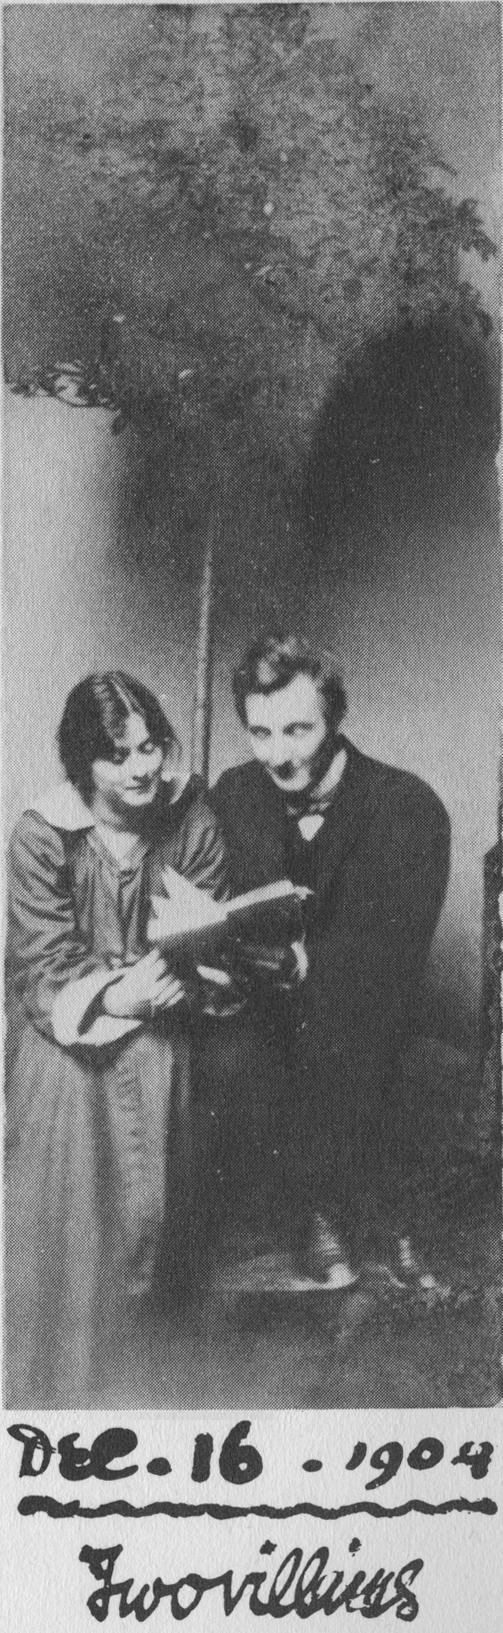 Two Villains – Isadora Duncan and Gordon Craig, Berlin 16 December 1904